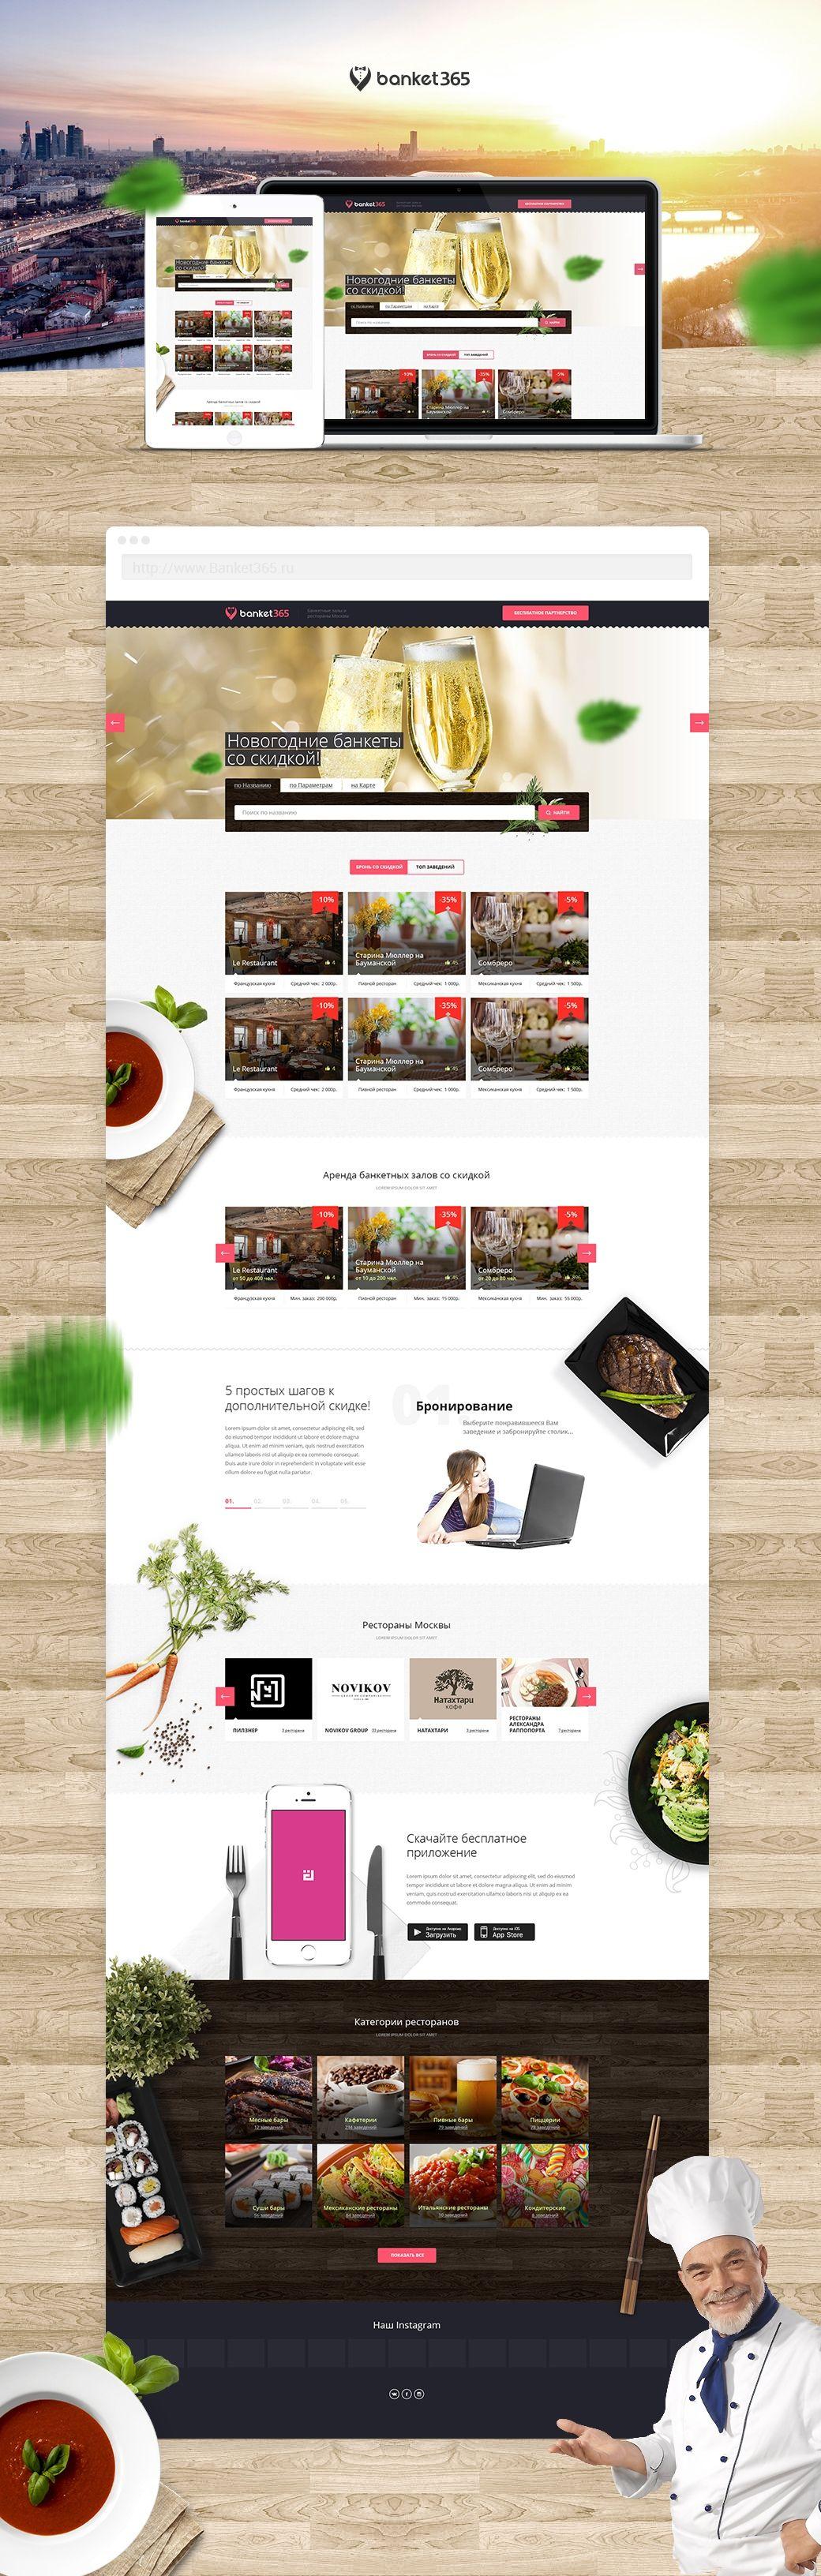 Landing page для Banket365.ru - дизайнер slavikx3m